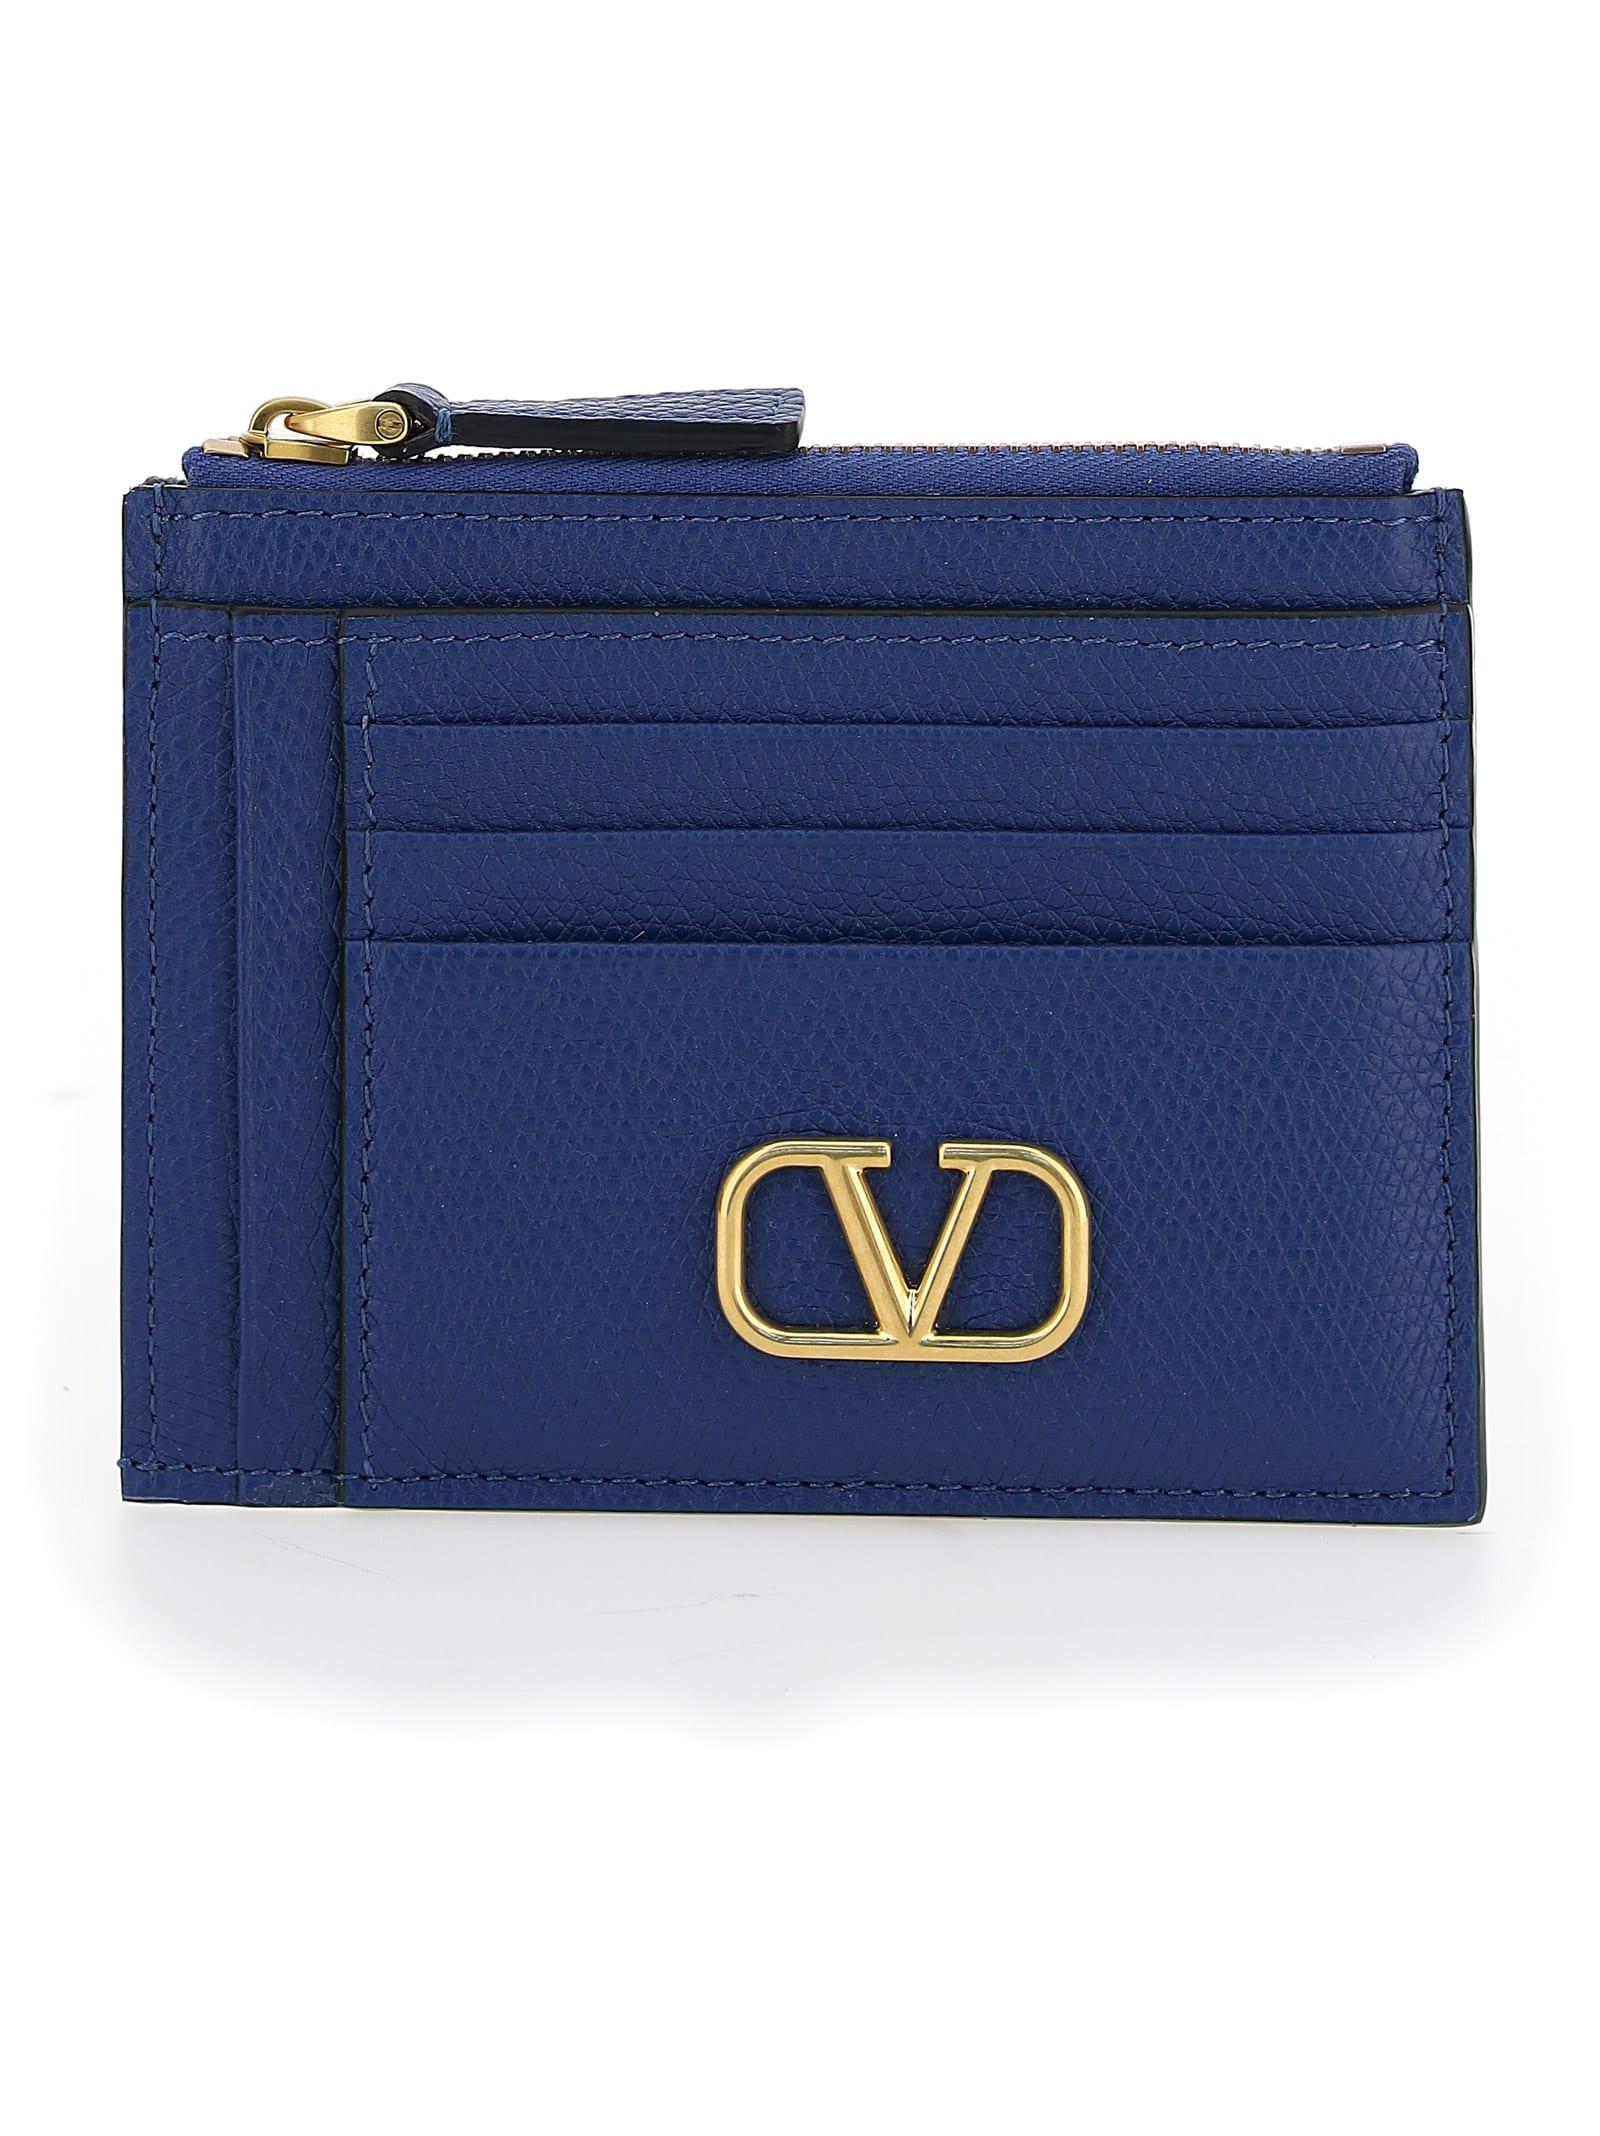 Valentino Garavani Card Holder In Blu Delft